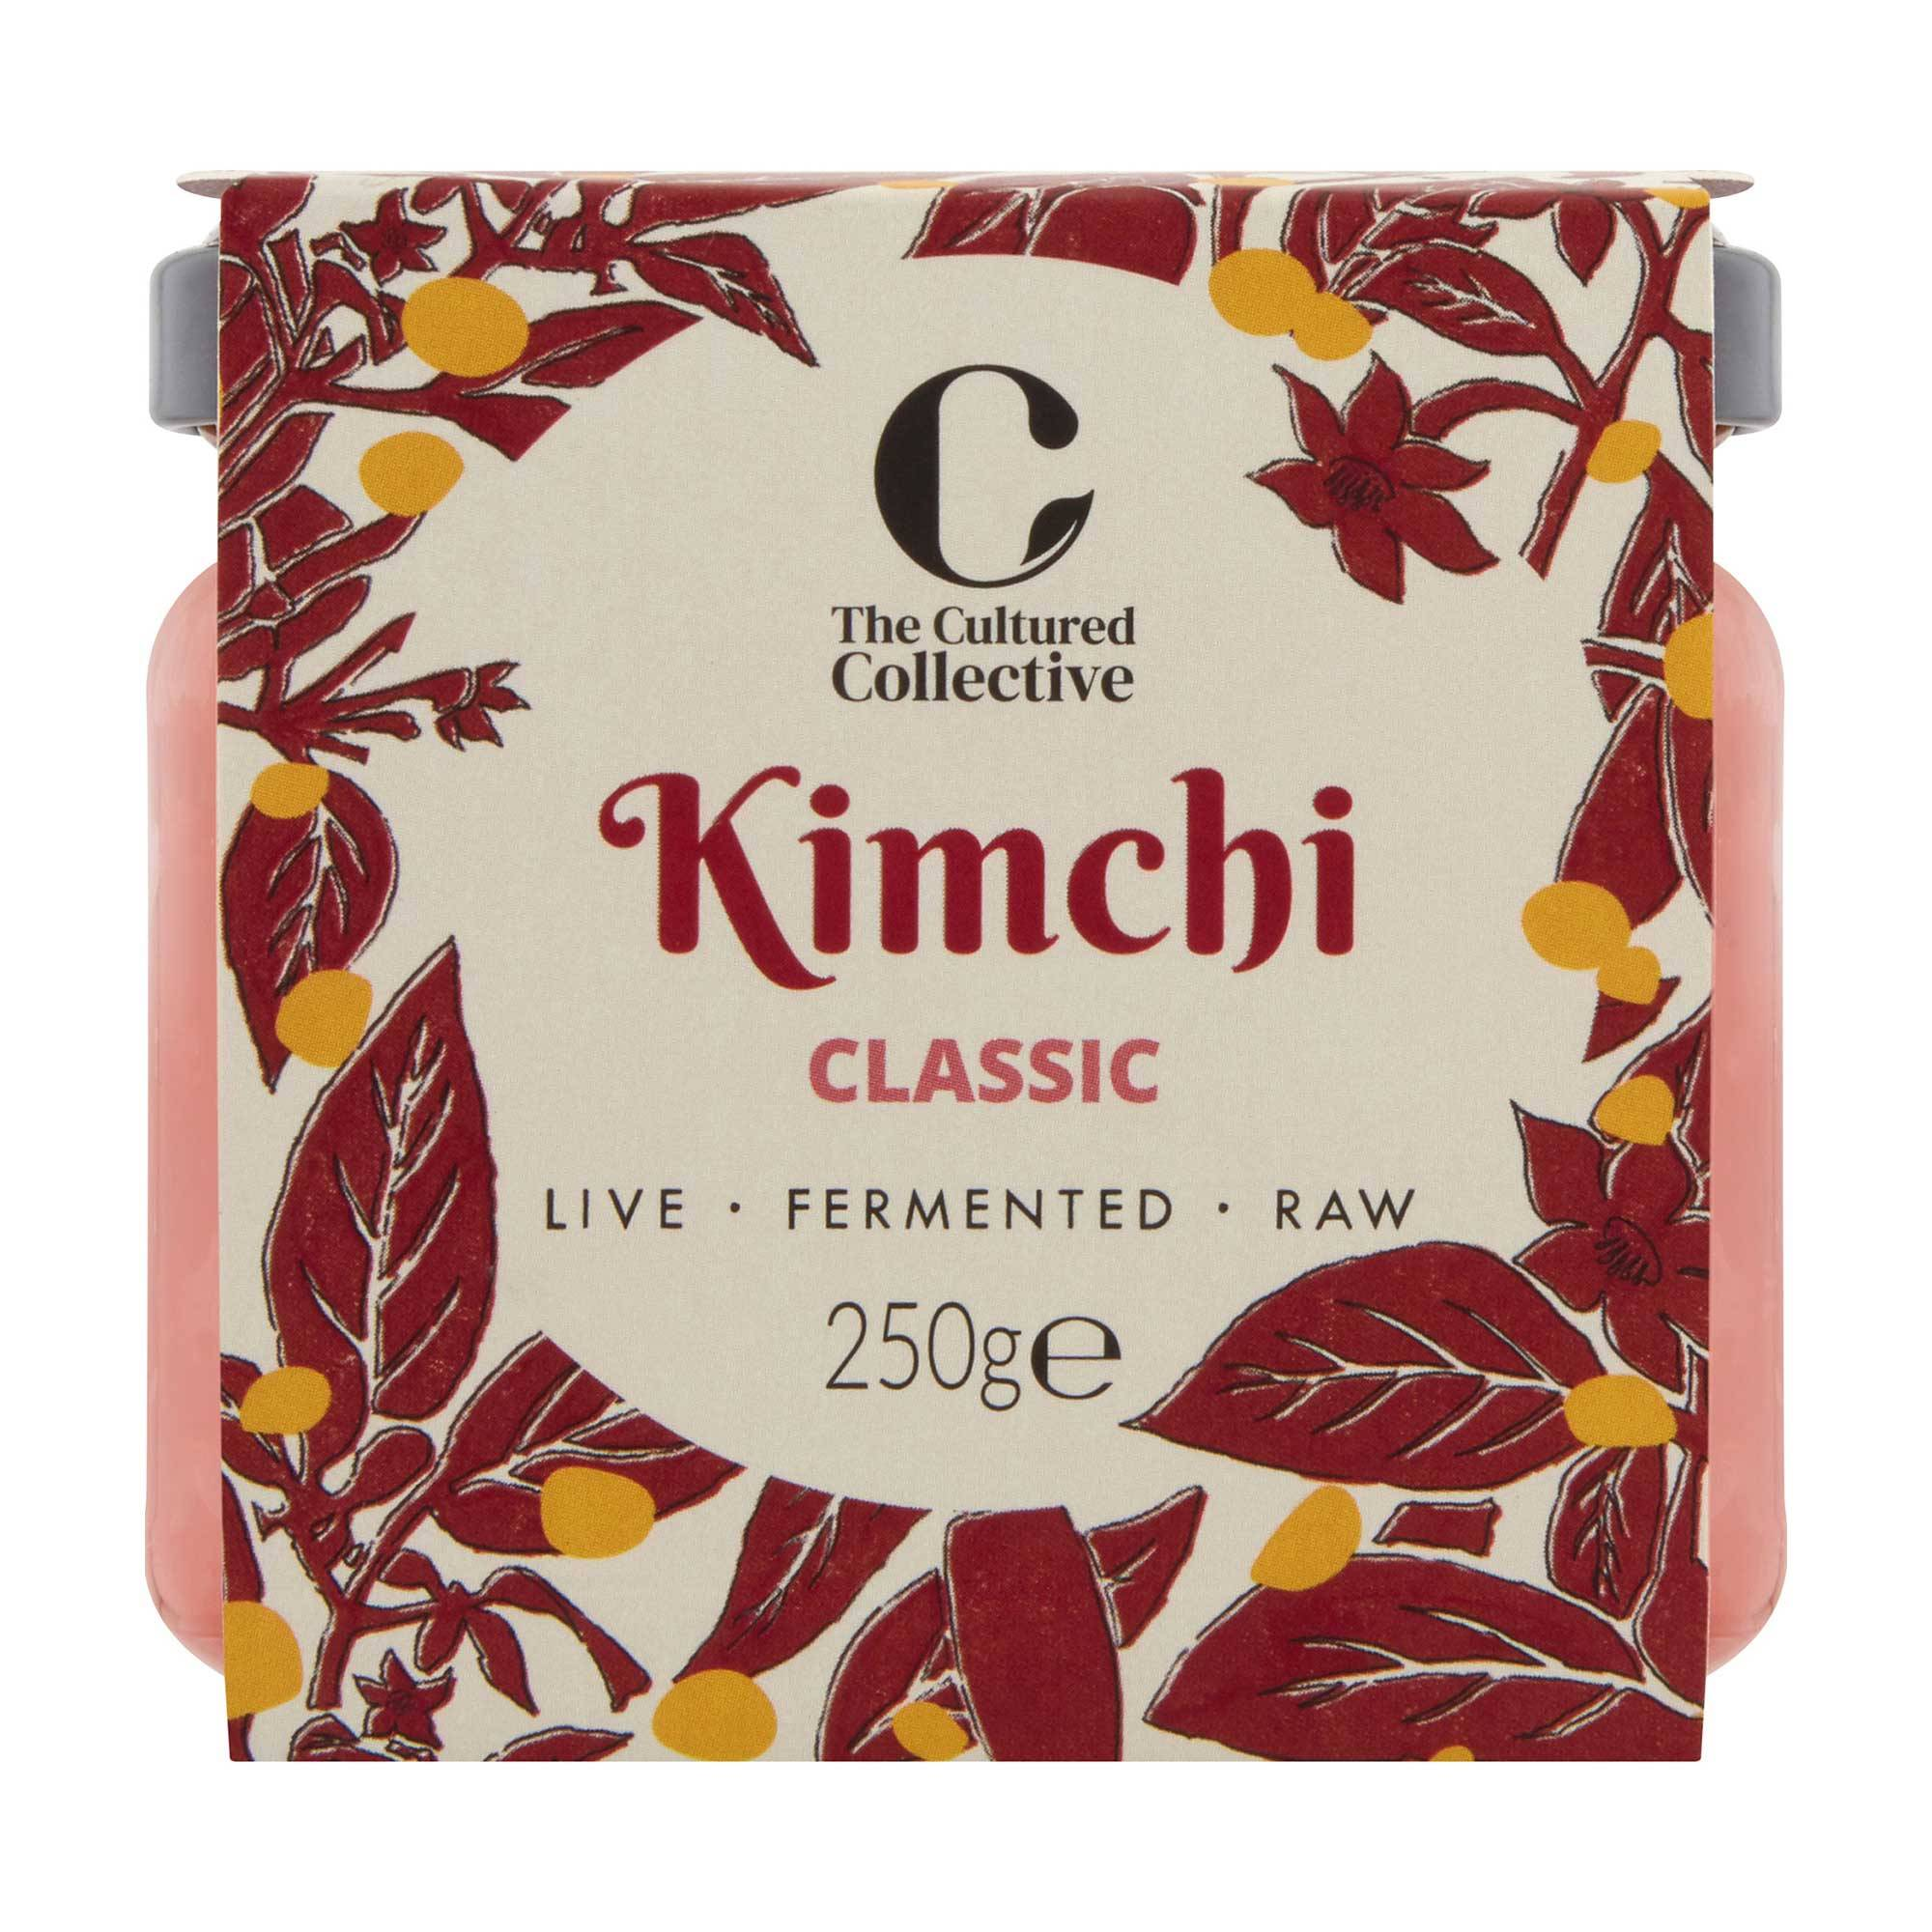 CC Classic Kimchi